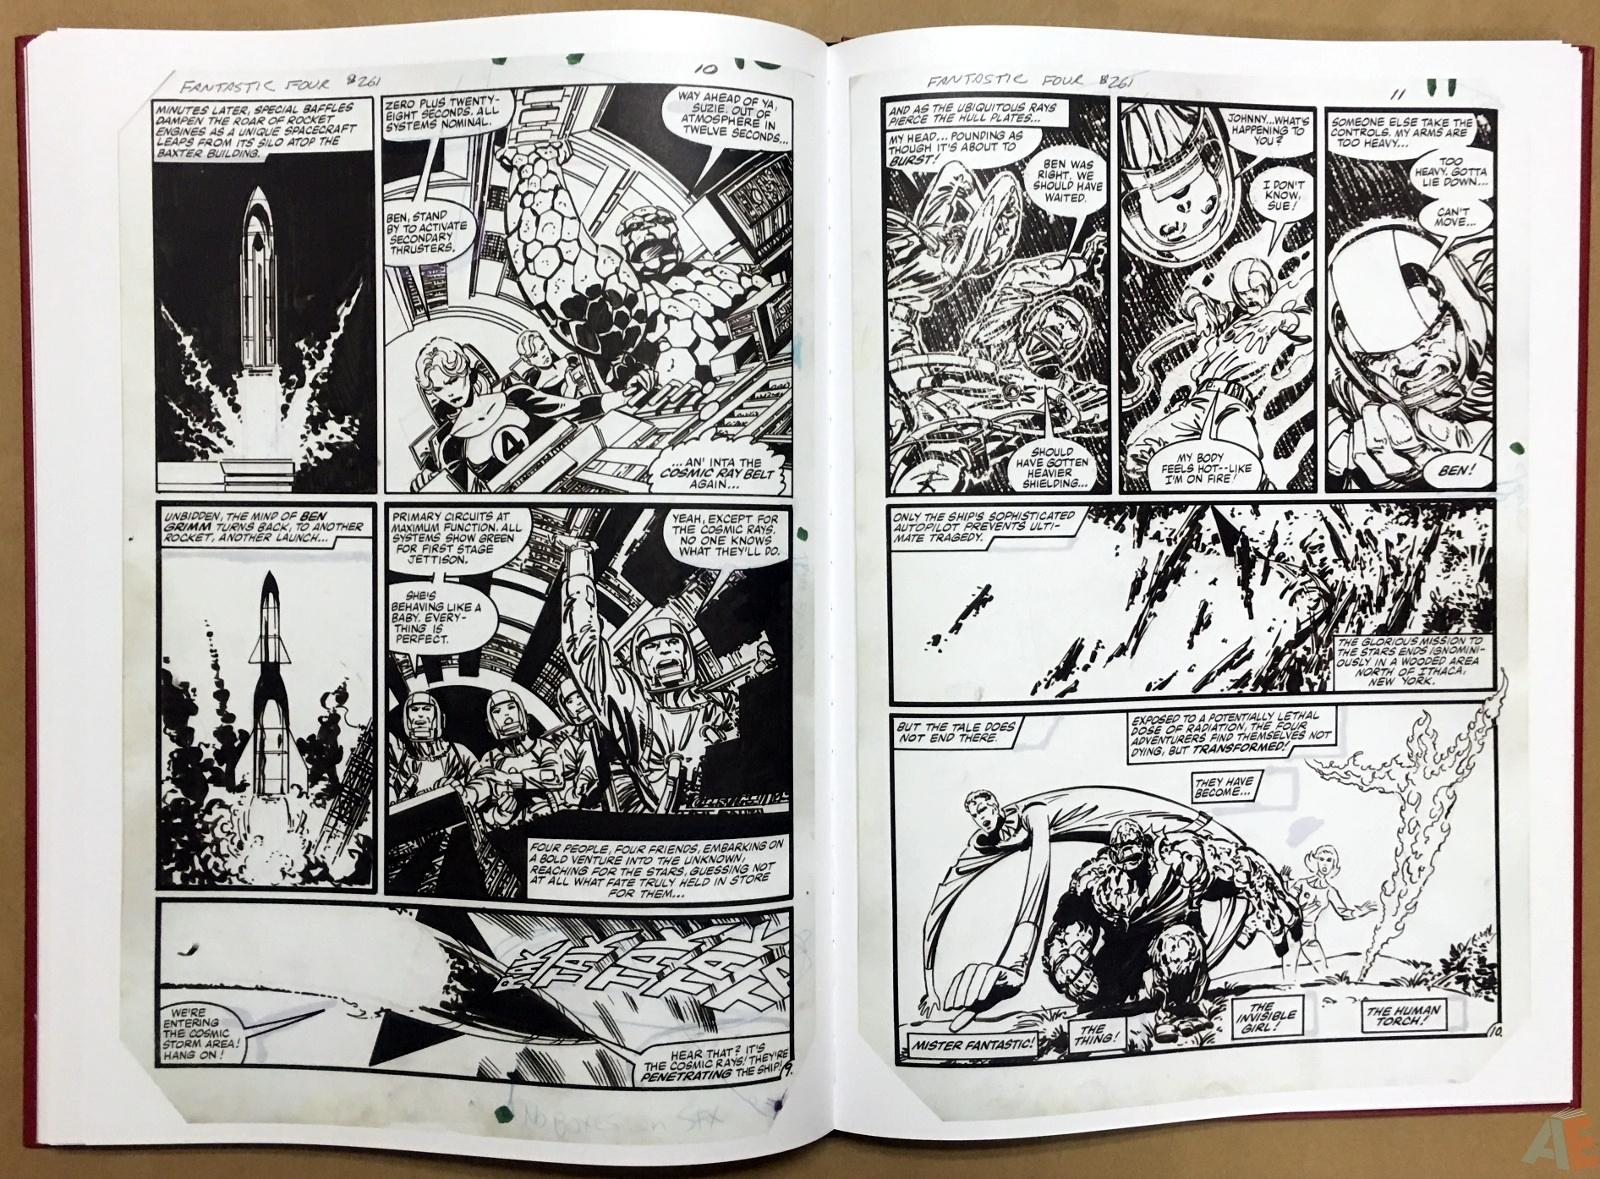 John Byrne's The Fantastic Four Artist's Edition 40